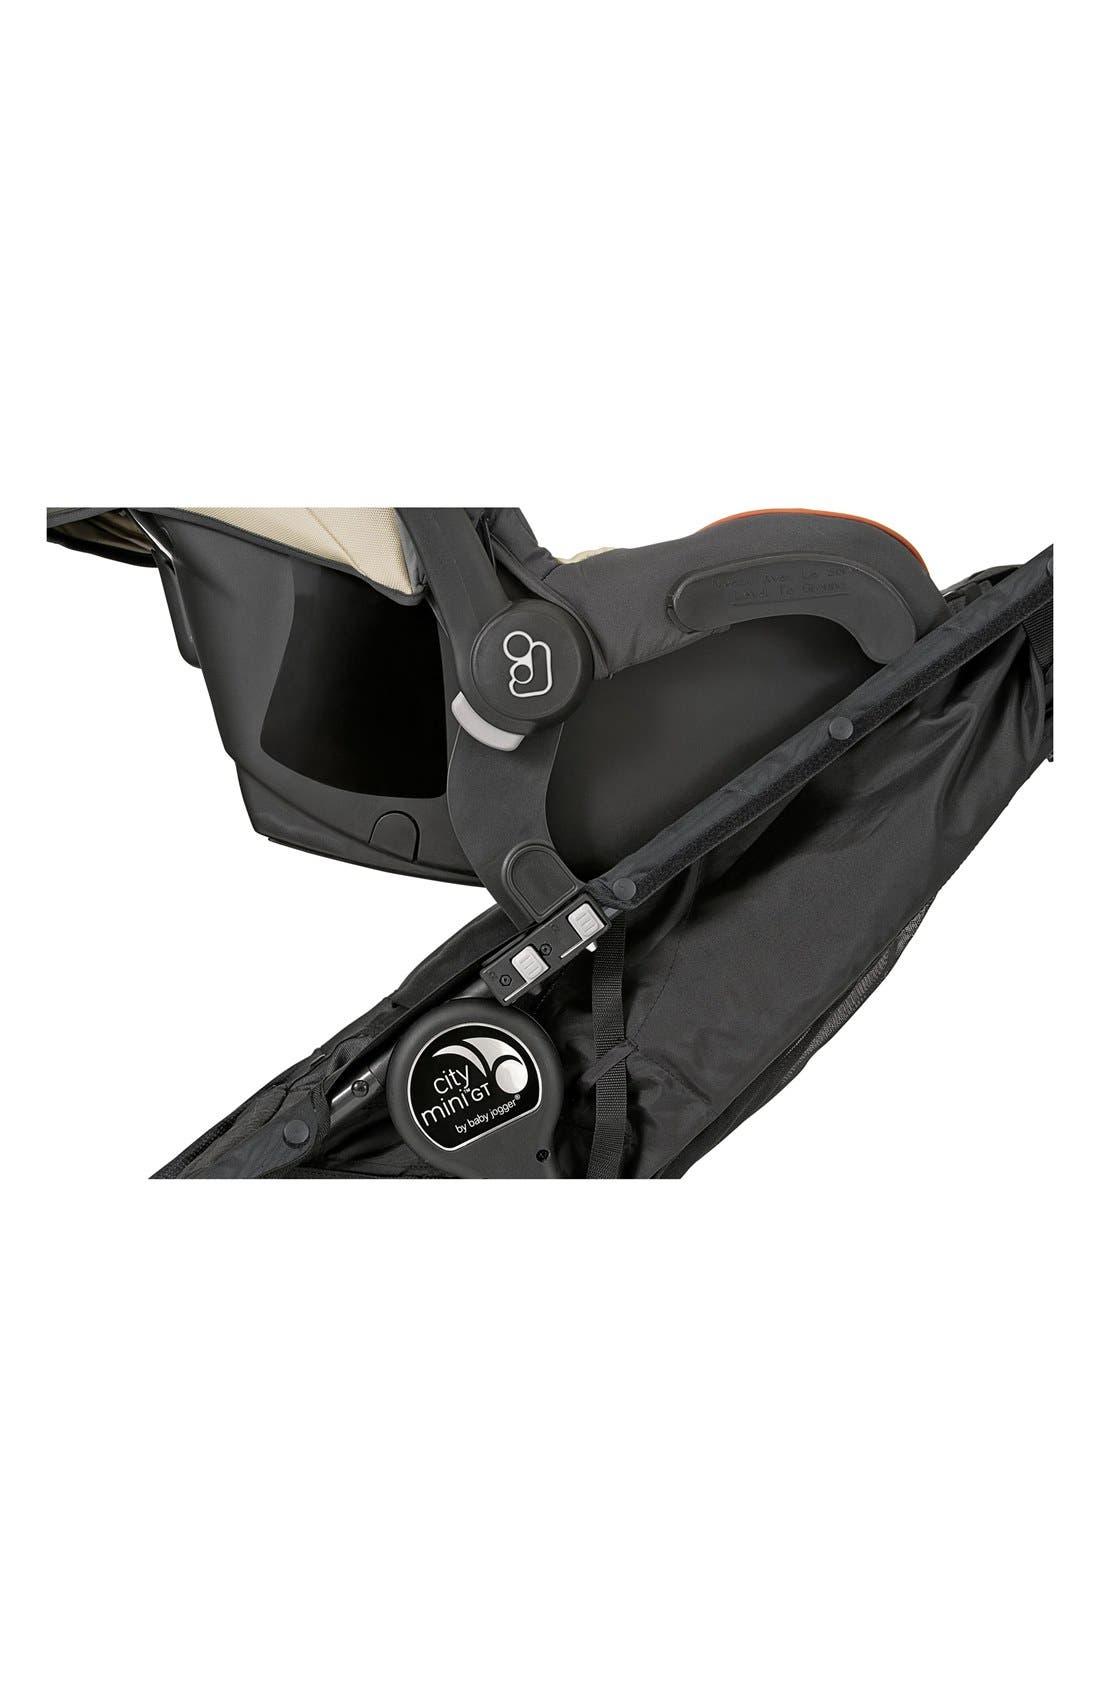 Main Image - Baby Jogger City Mini® Double/City Mini® GT Double Stroller to Cybex & Maxi-Cosi® Car Seat Adapter